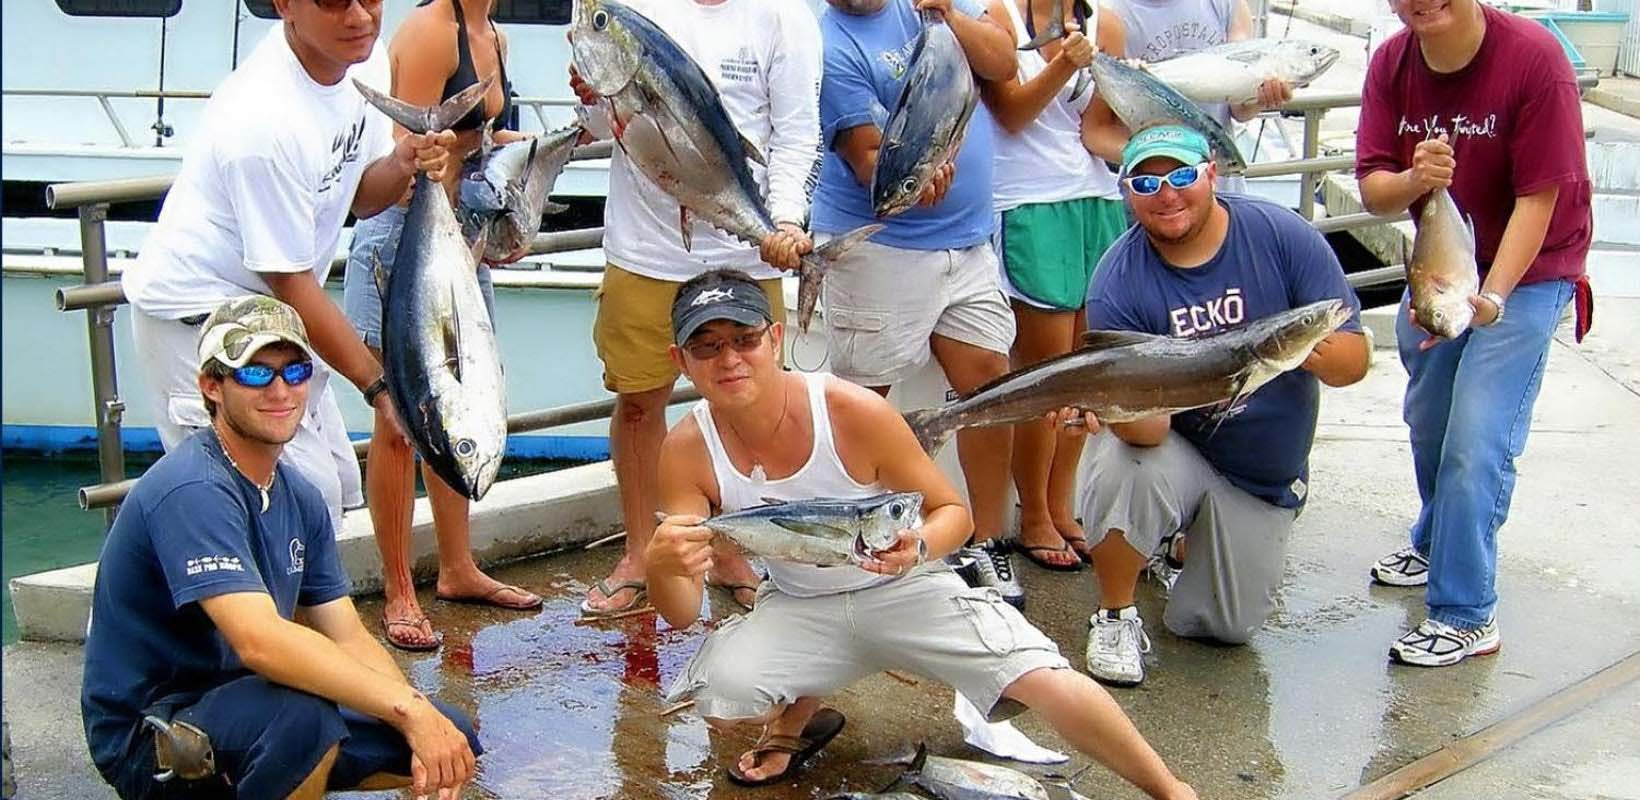 Sport Fishing Tour in Miami